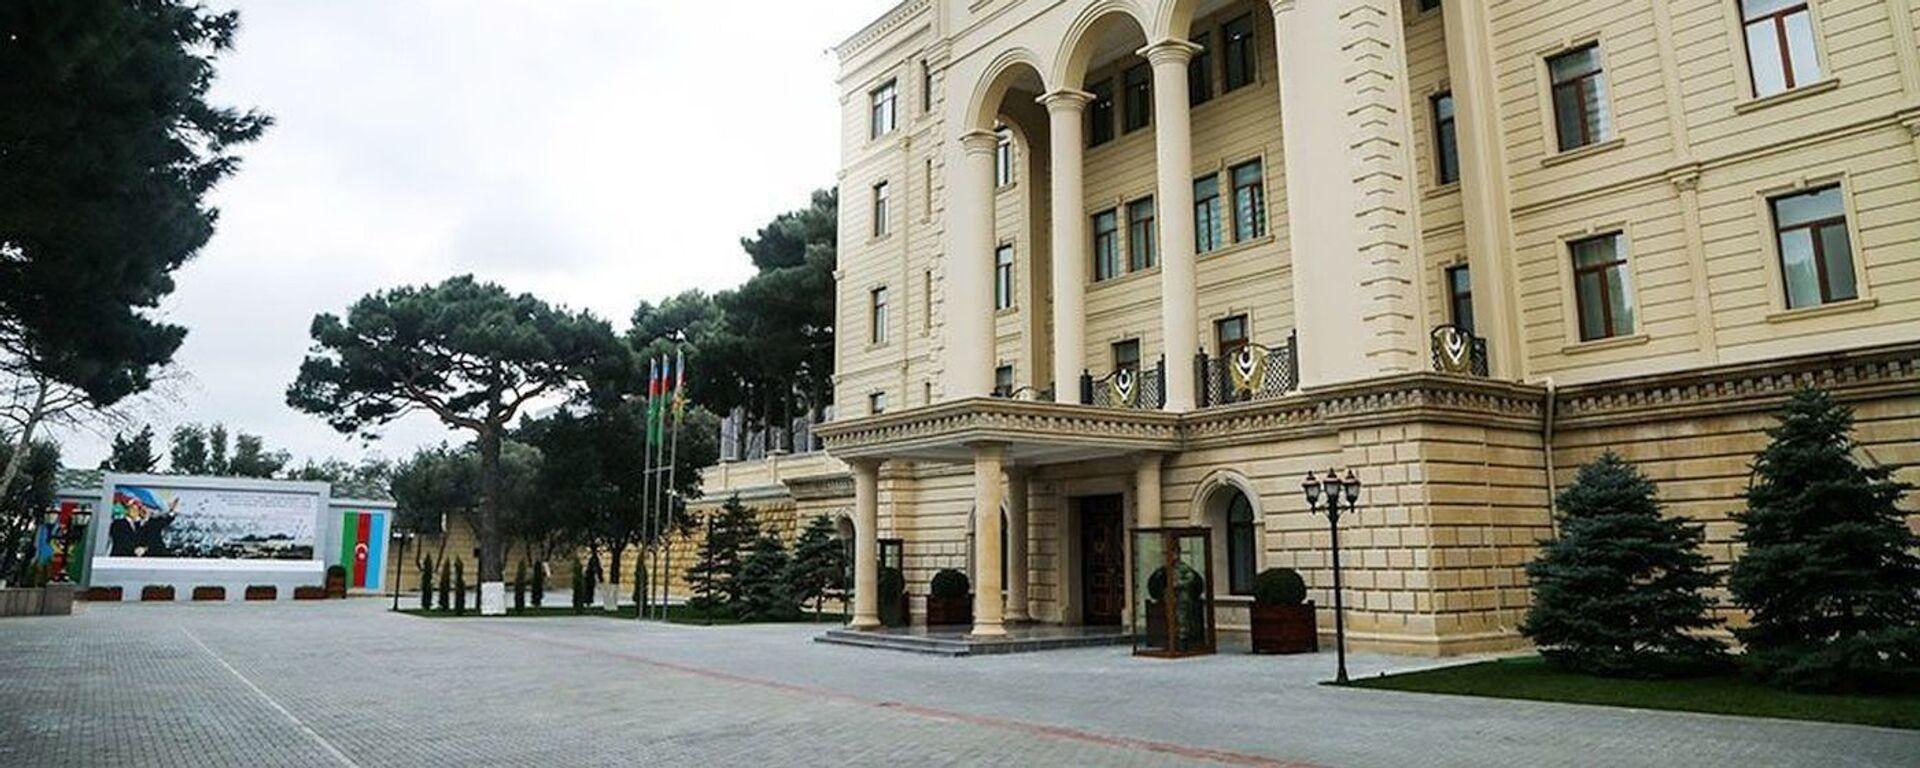 Здание министерства обороны Азербайджана, фото из архива - Sputnik Азербайджан, 1920, 28.02.2021